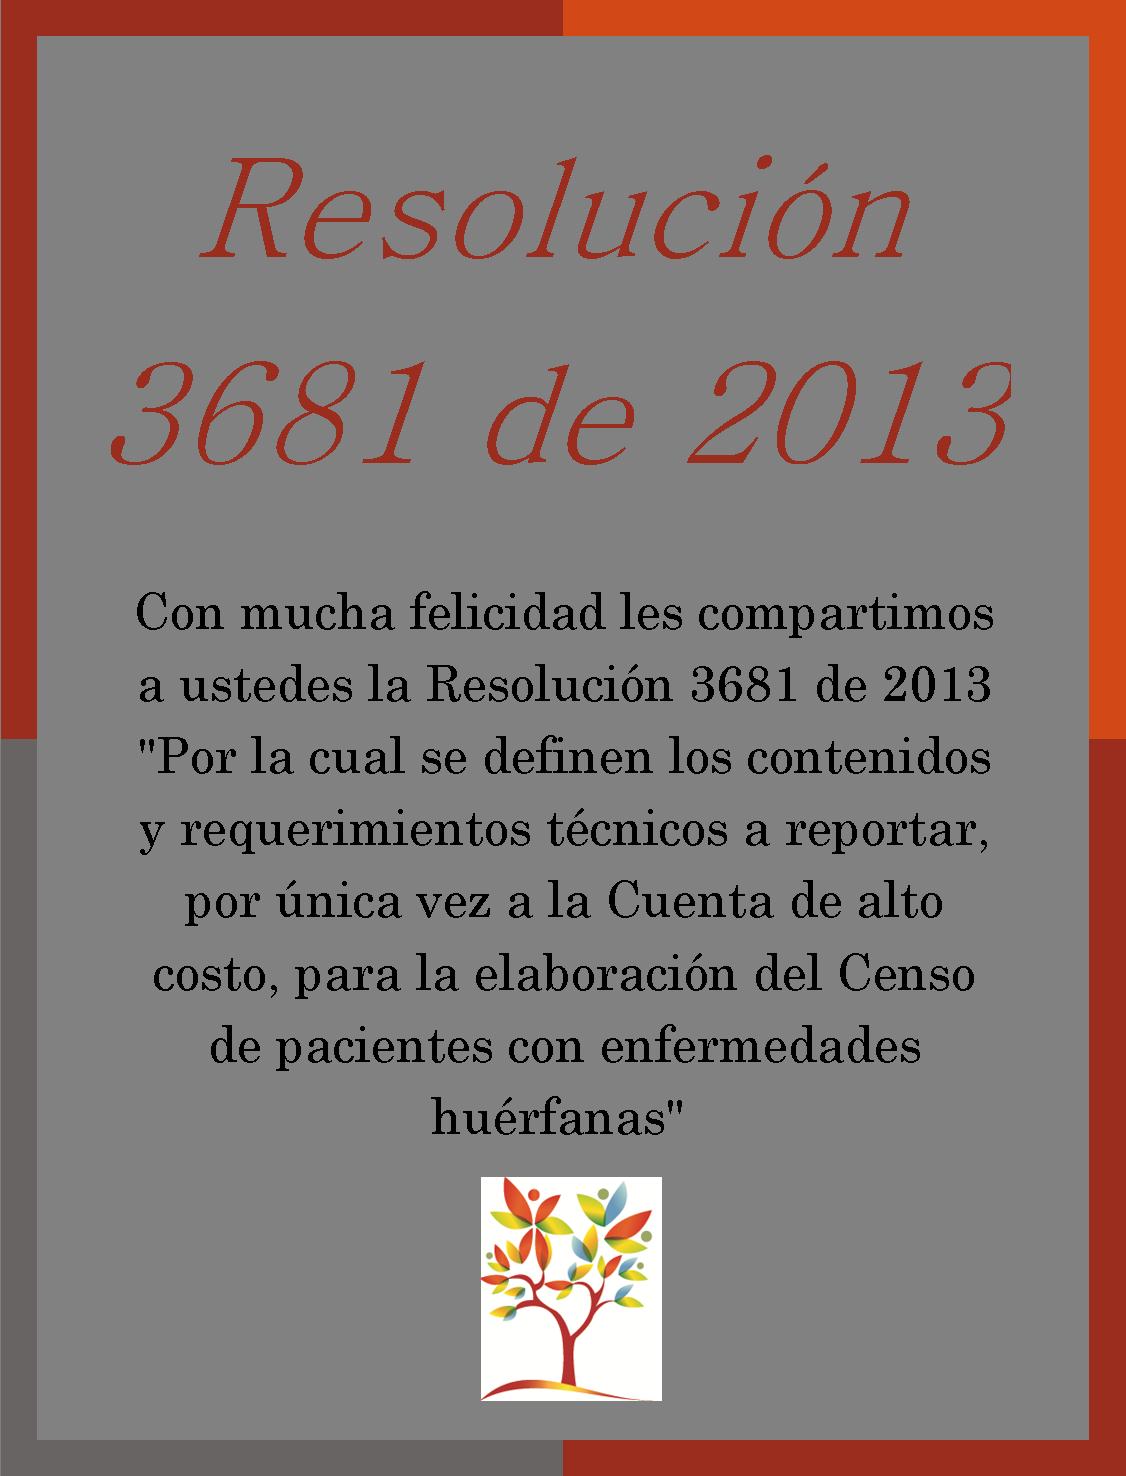 imagen resolucion 3681 2013